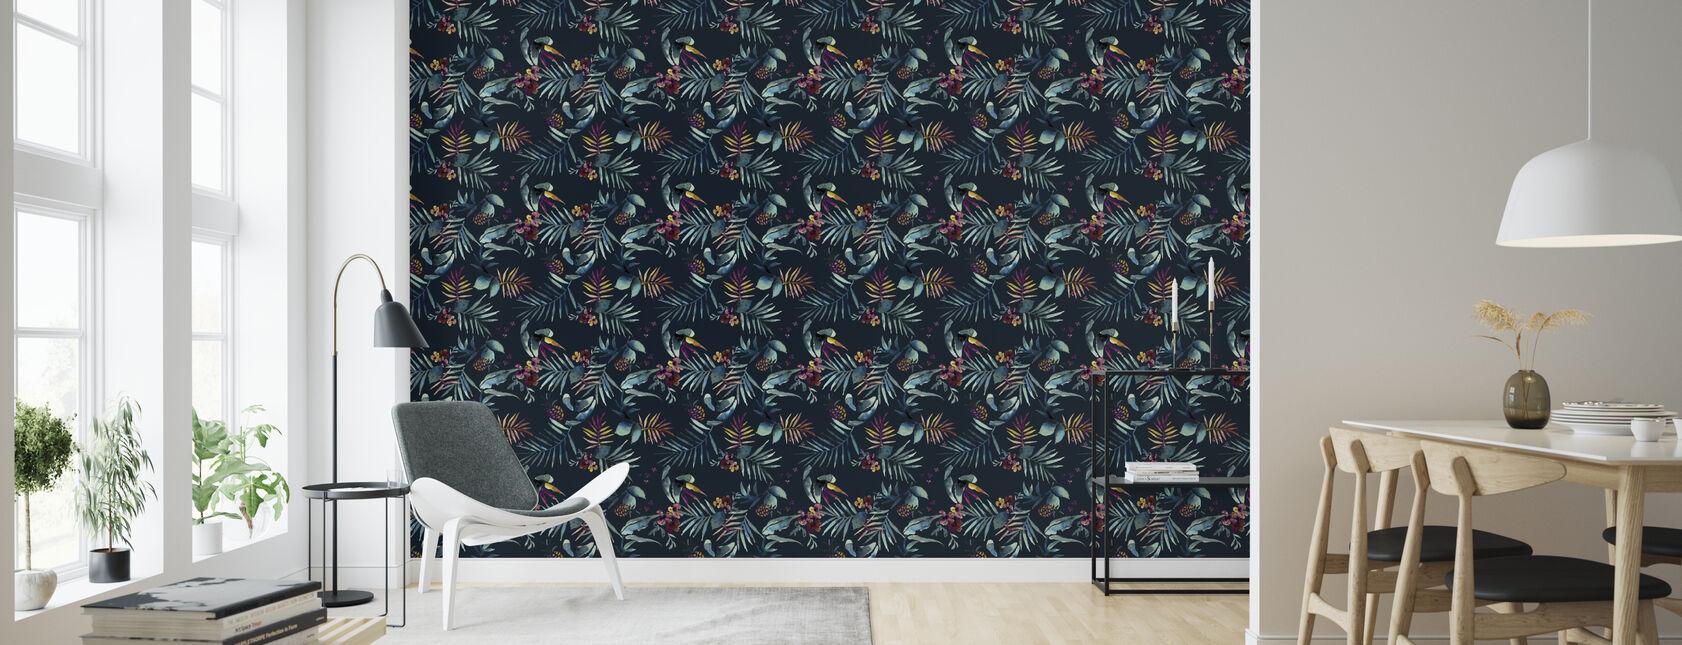 Dark Tropico - Wallpaper - Living Room